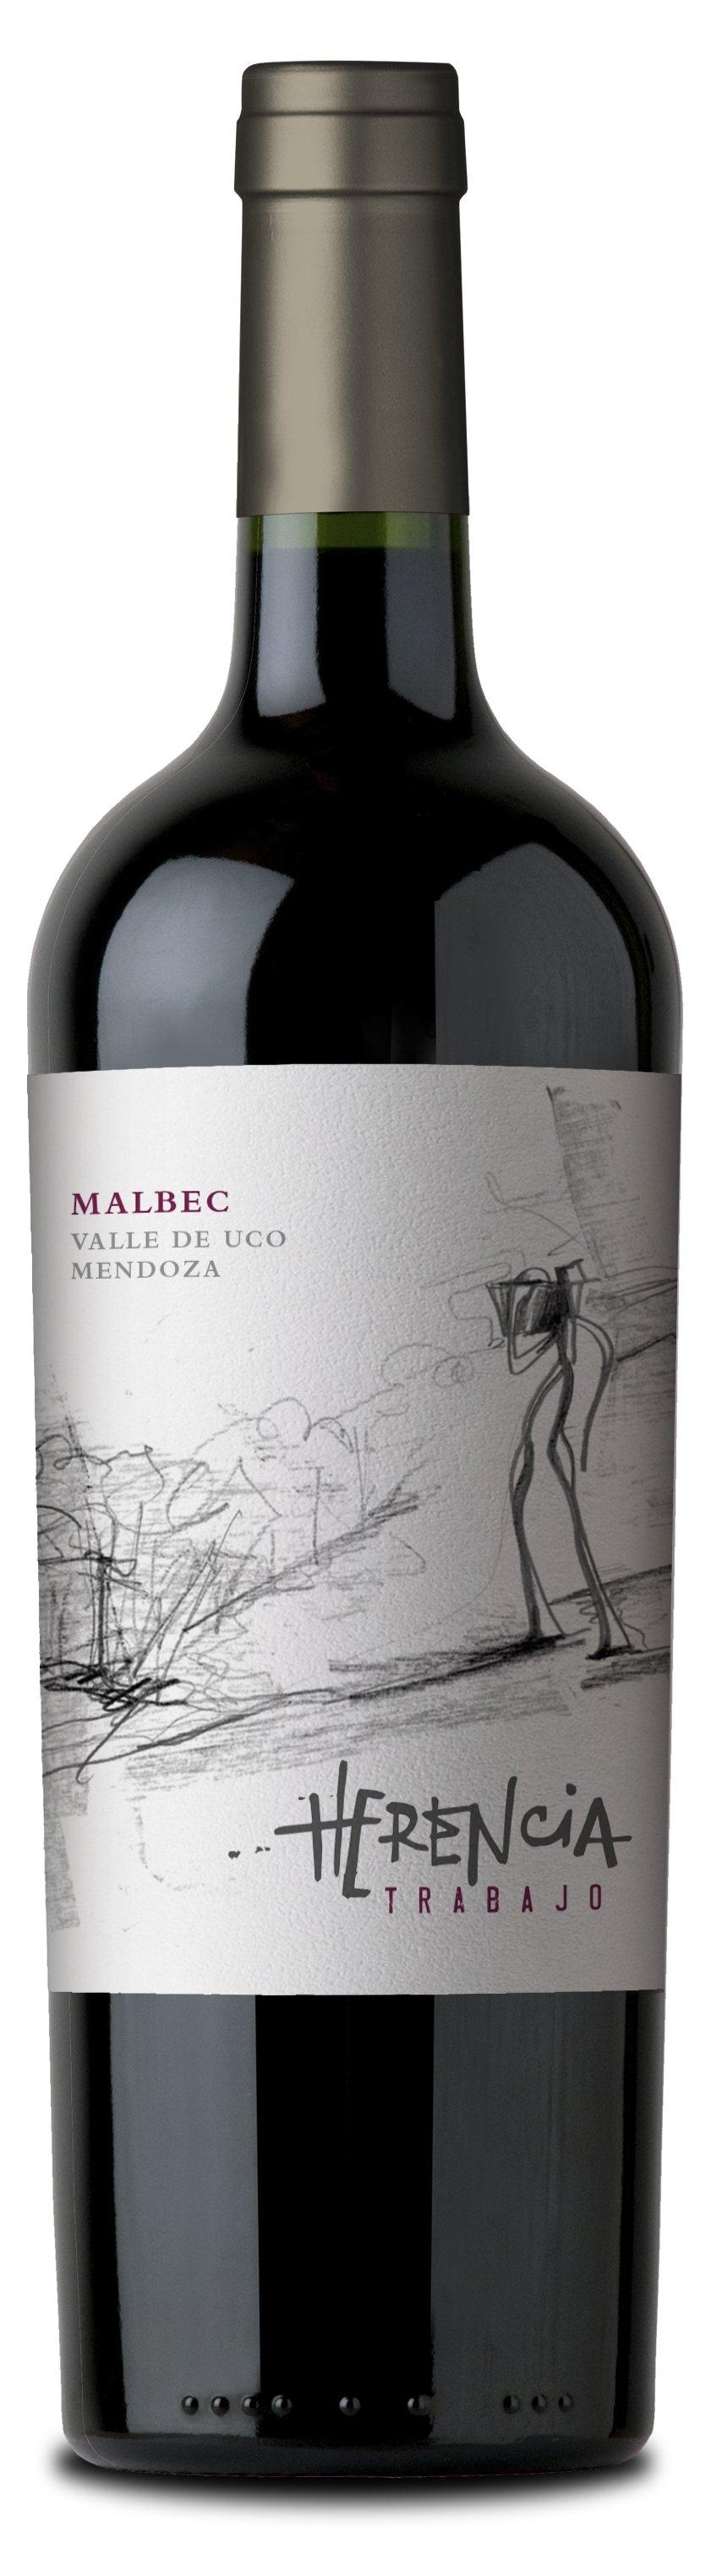 Caudalia wine Box Mayo 2021 Bodega Polo herencia blend Malbec Pinot Noir Argentina